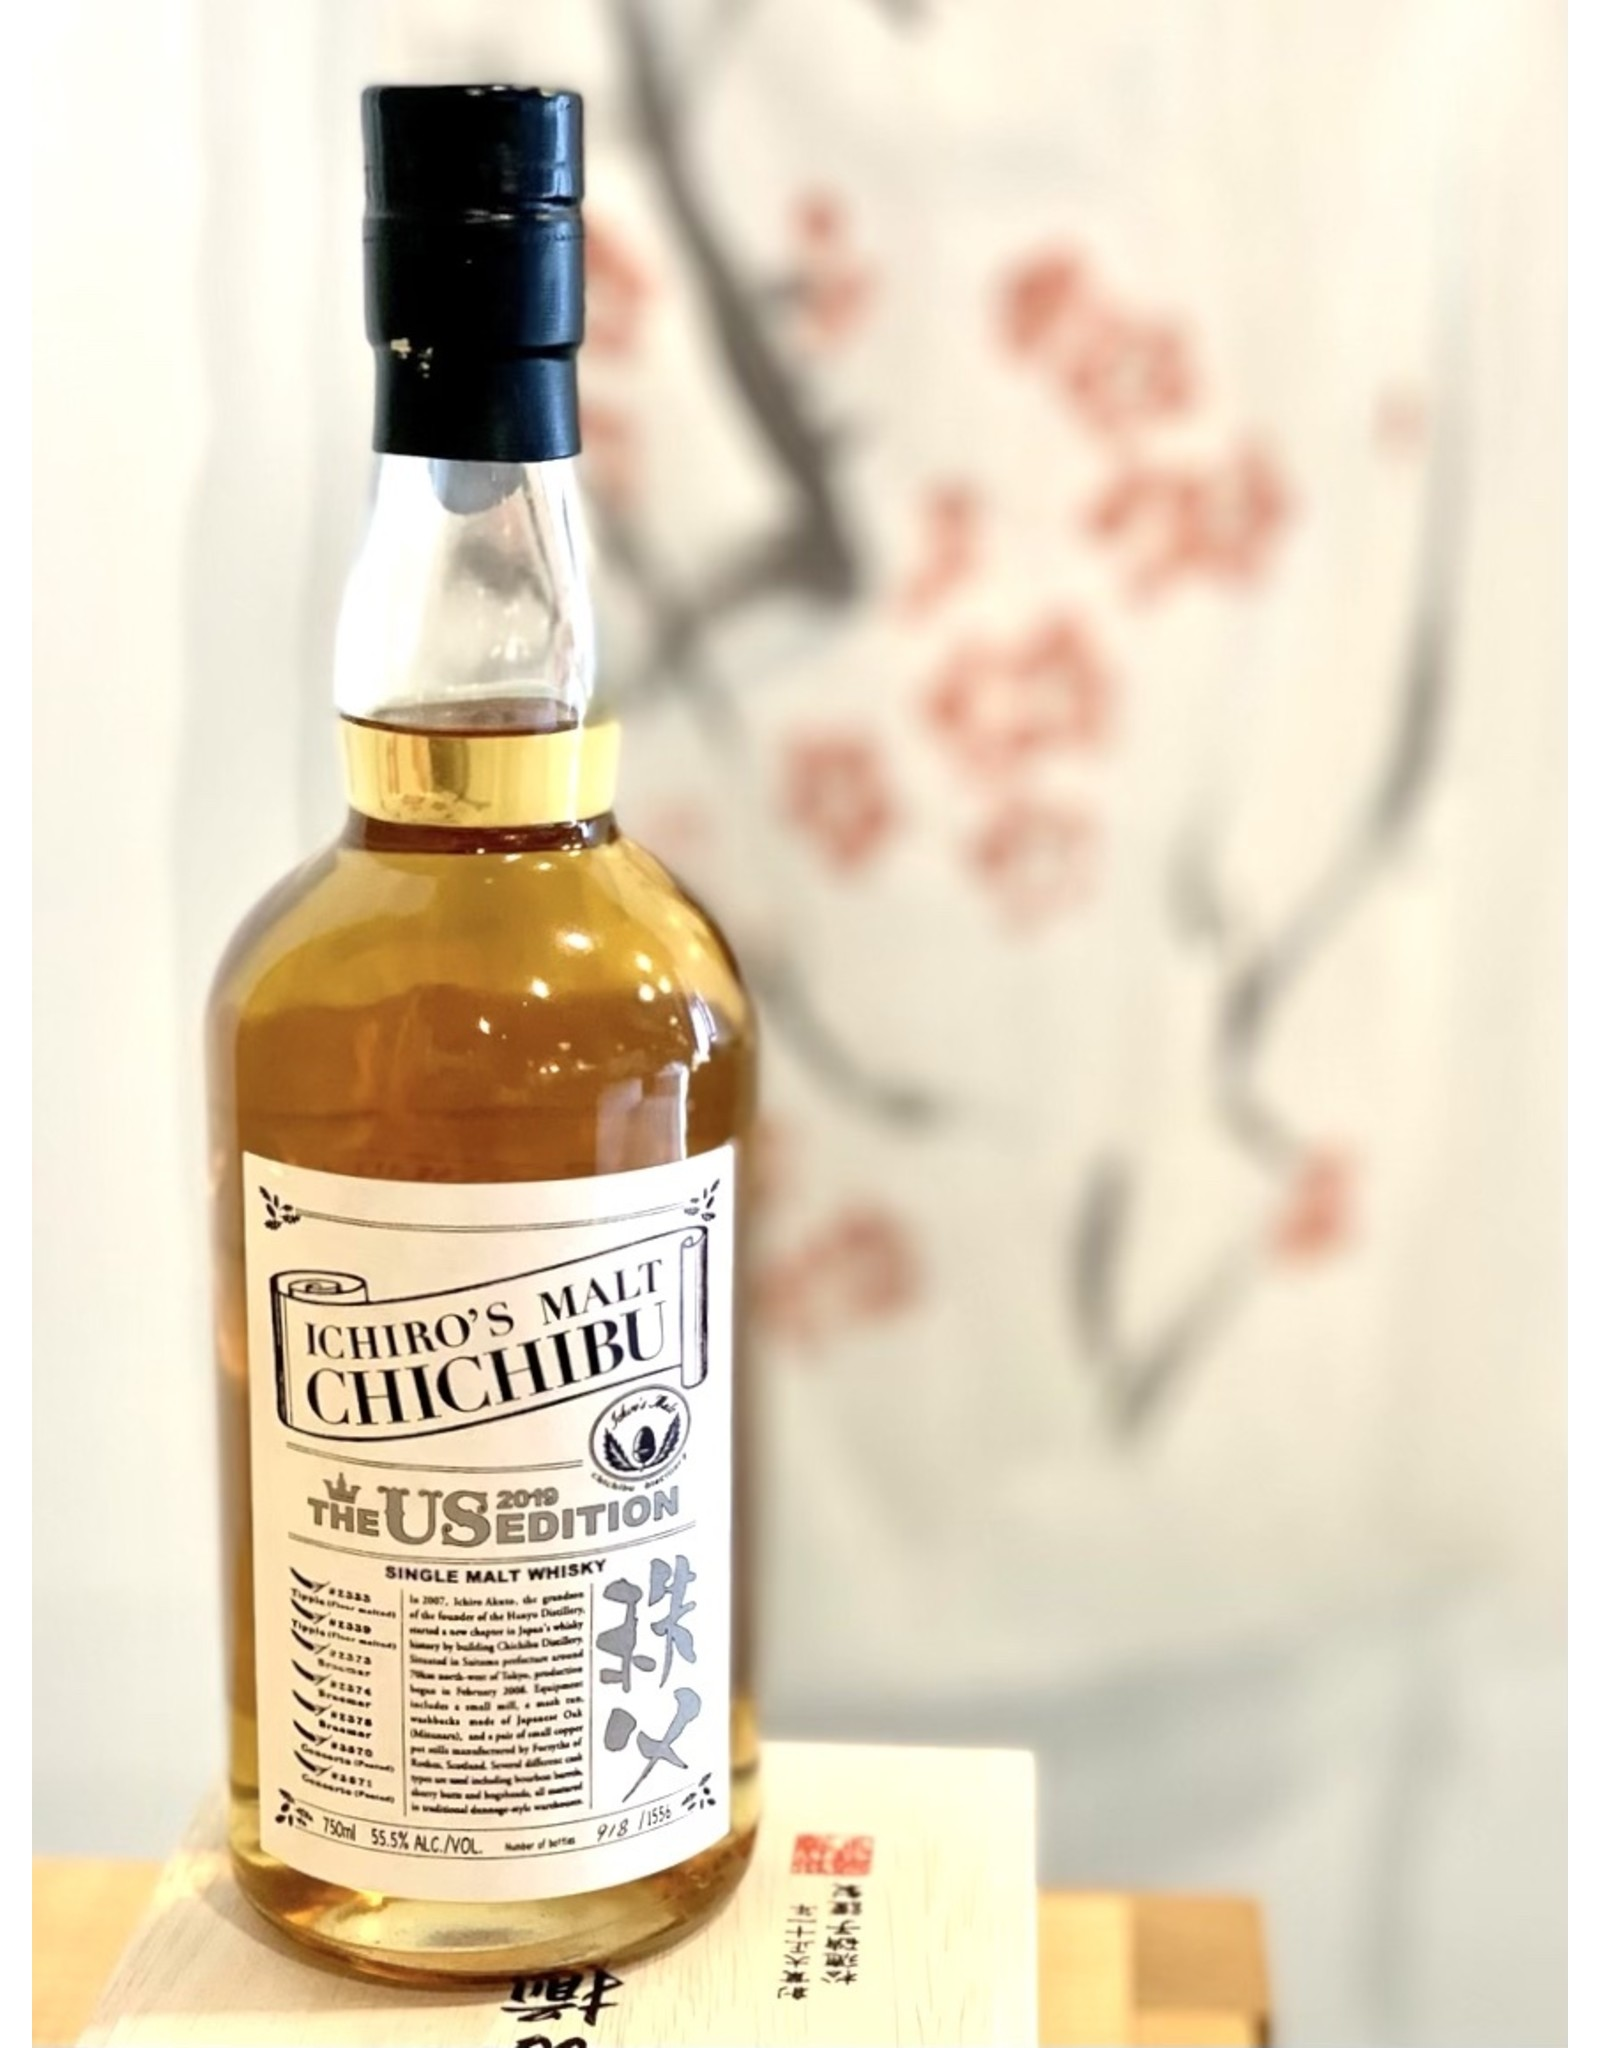 Ichiro's Malt Chichibu Single Malt Whisky